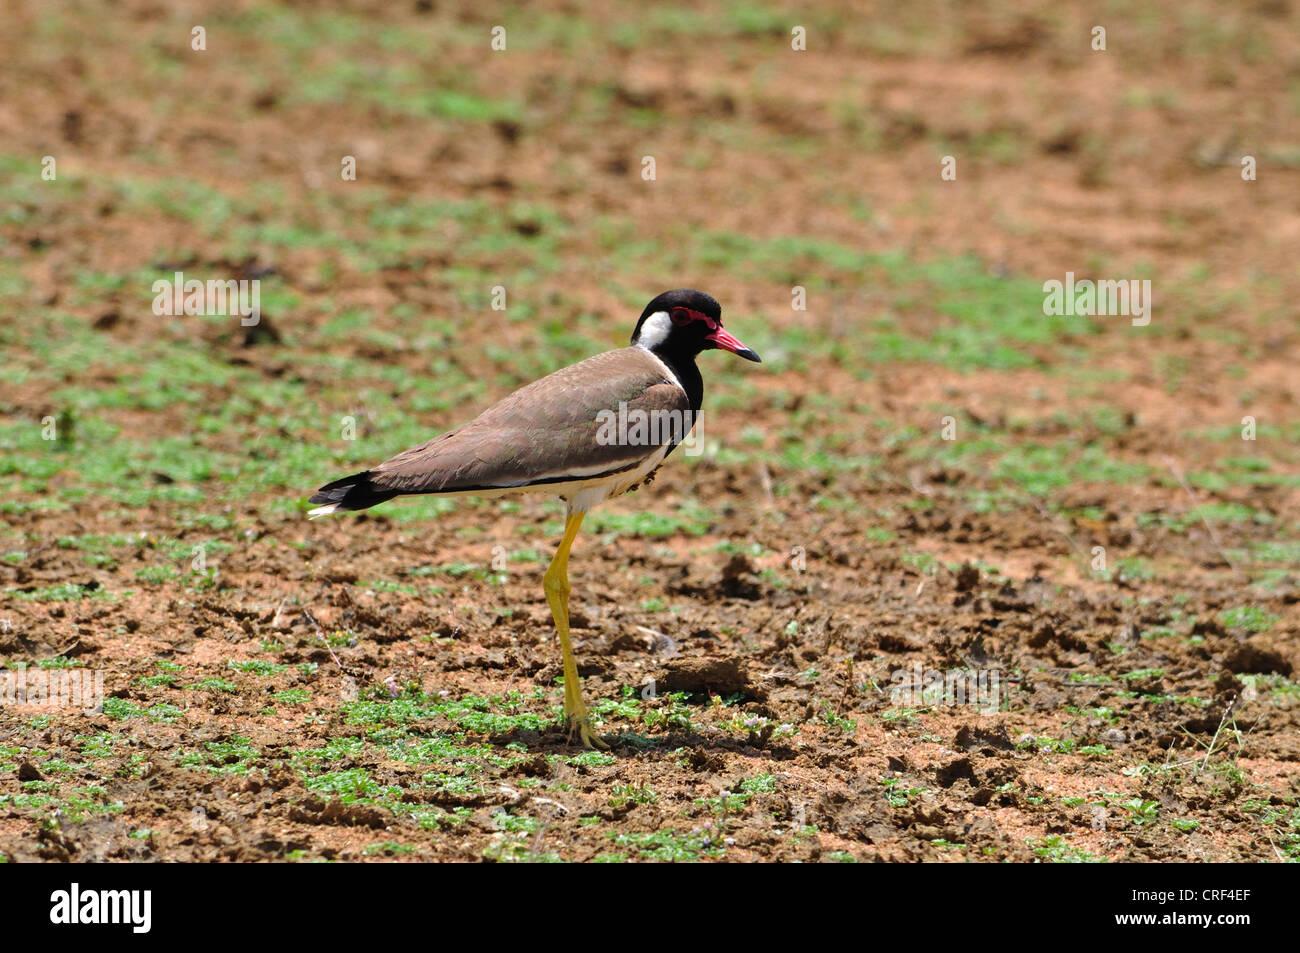 Indian Redwattled Lapwing - Stock Image